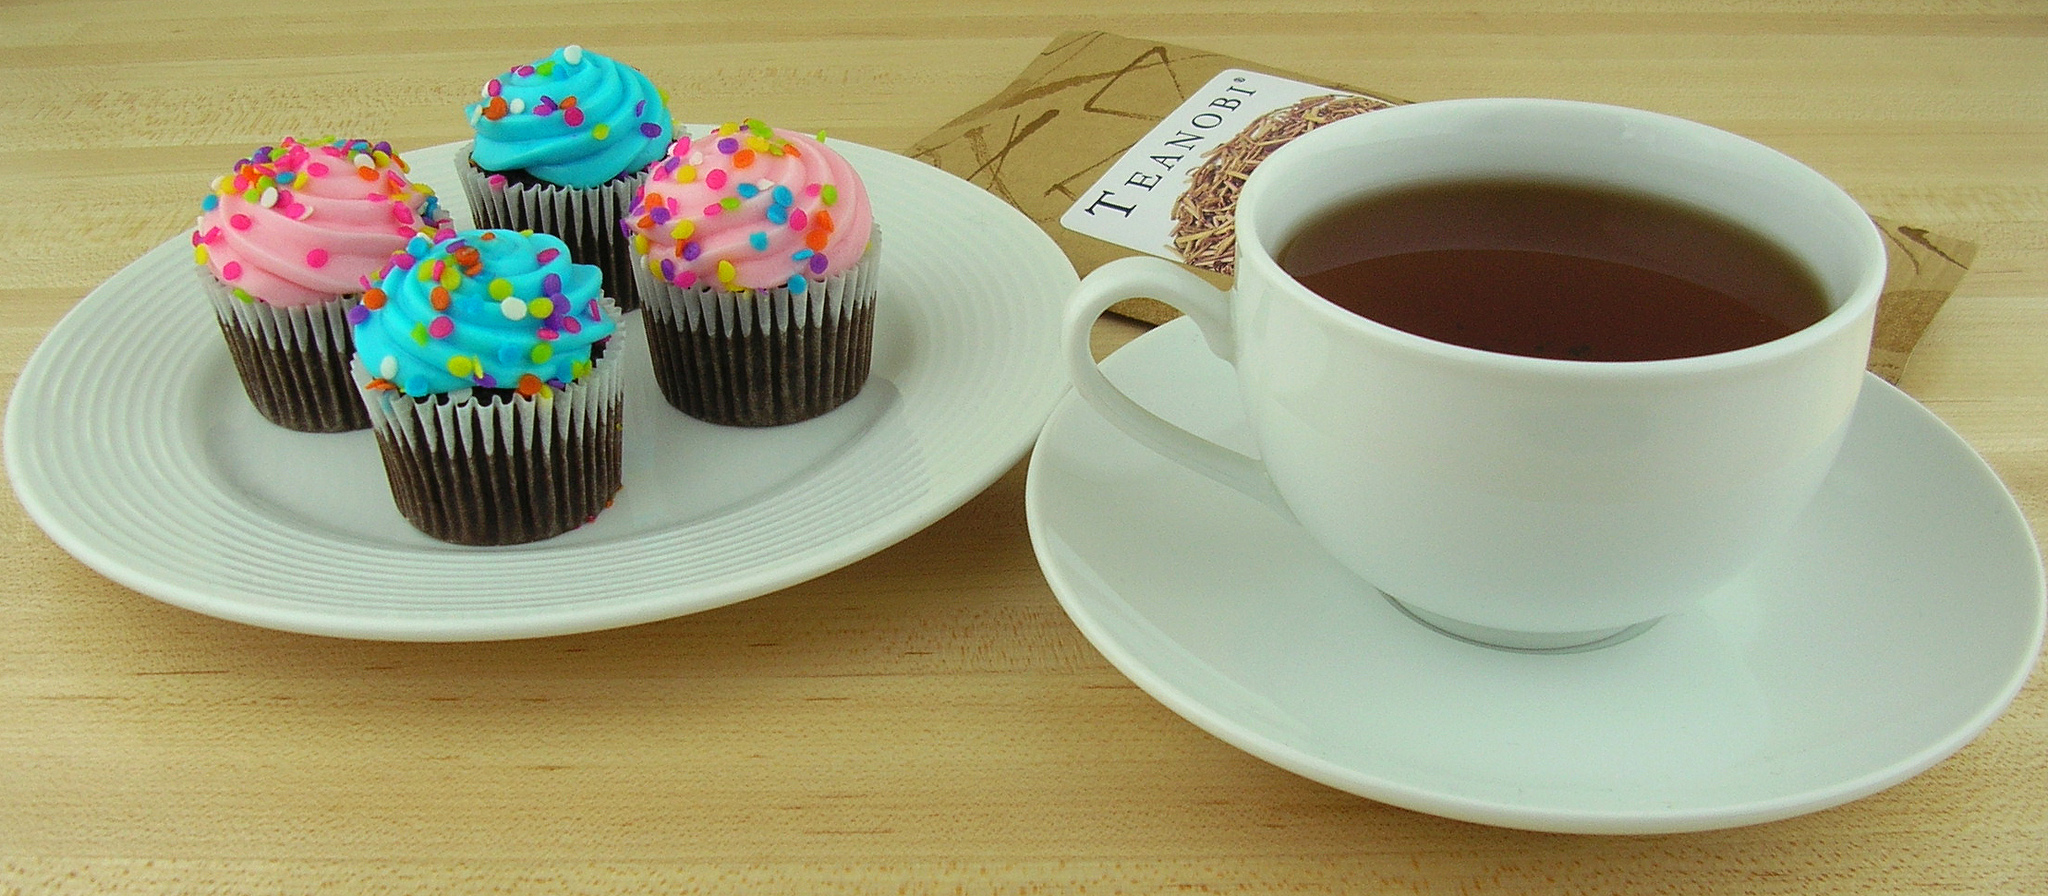 Spring Cupcakes and Hojicha Stalk Tea by Kirinohana